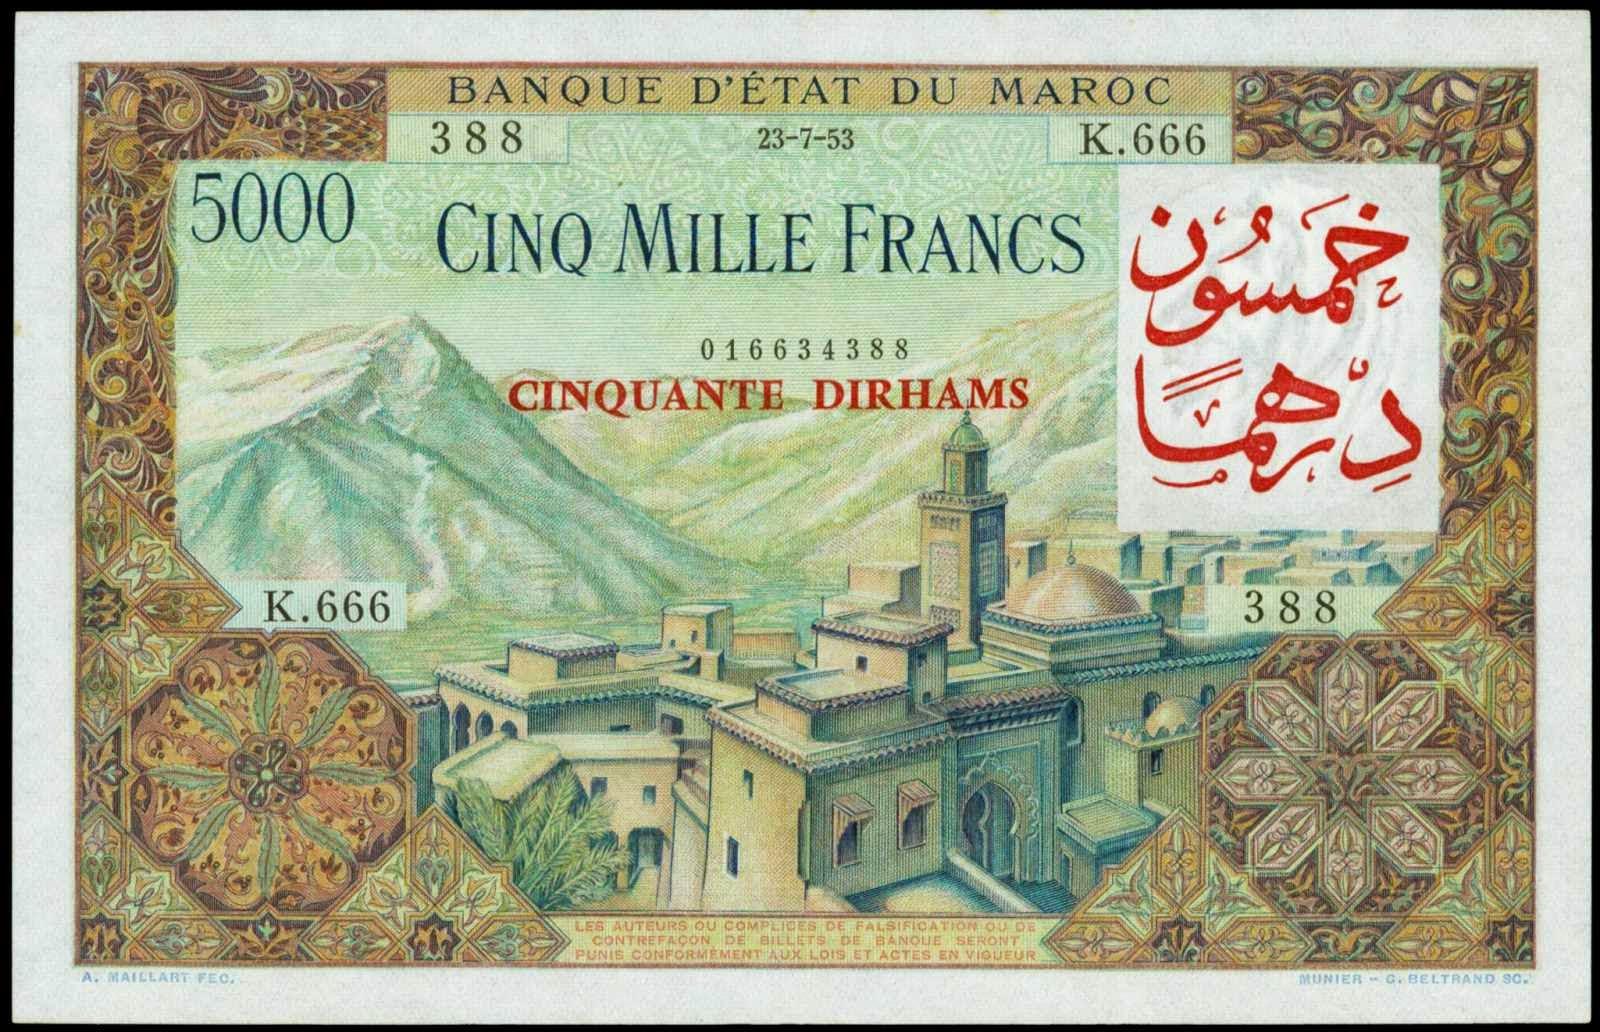 Morocco paper money 50 Dirhams 5000 Francs banknote Marrakech